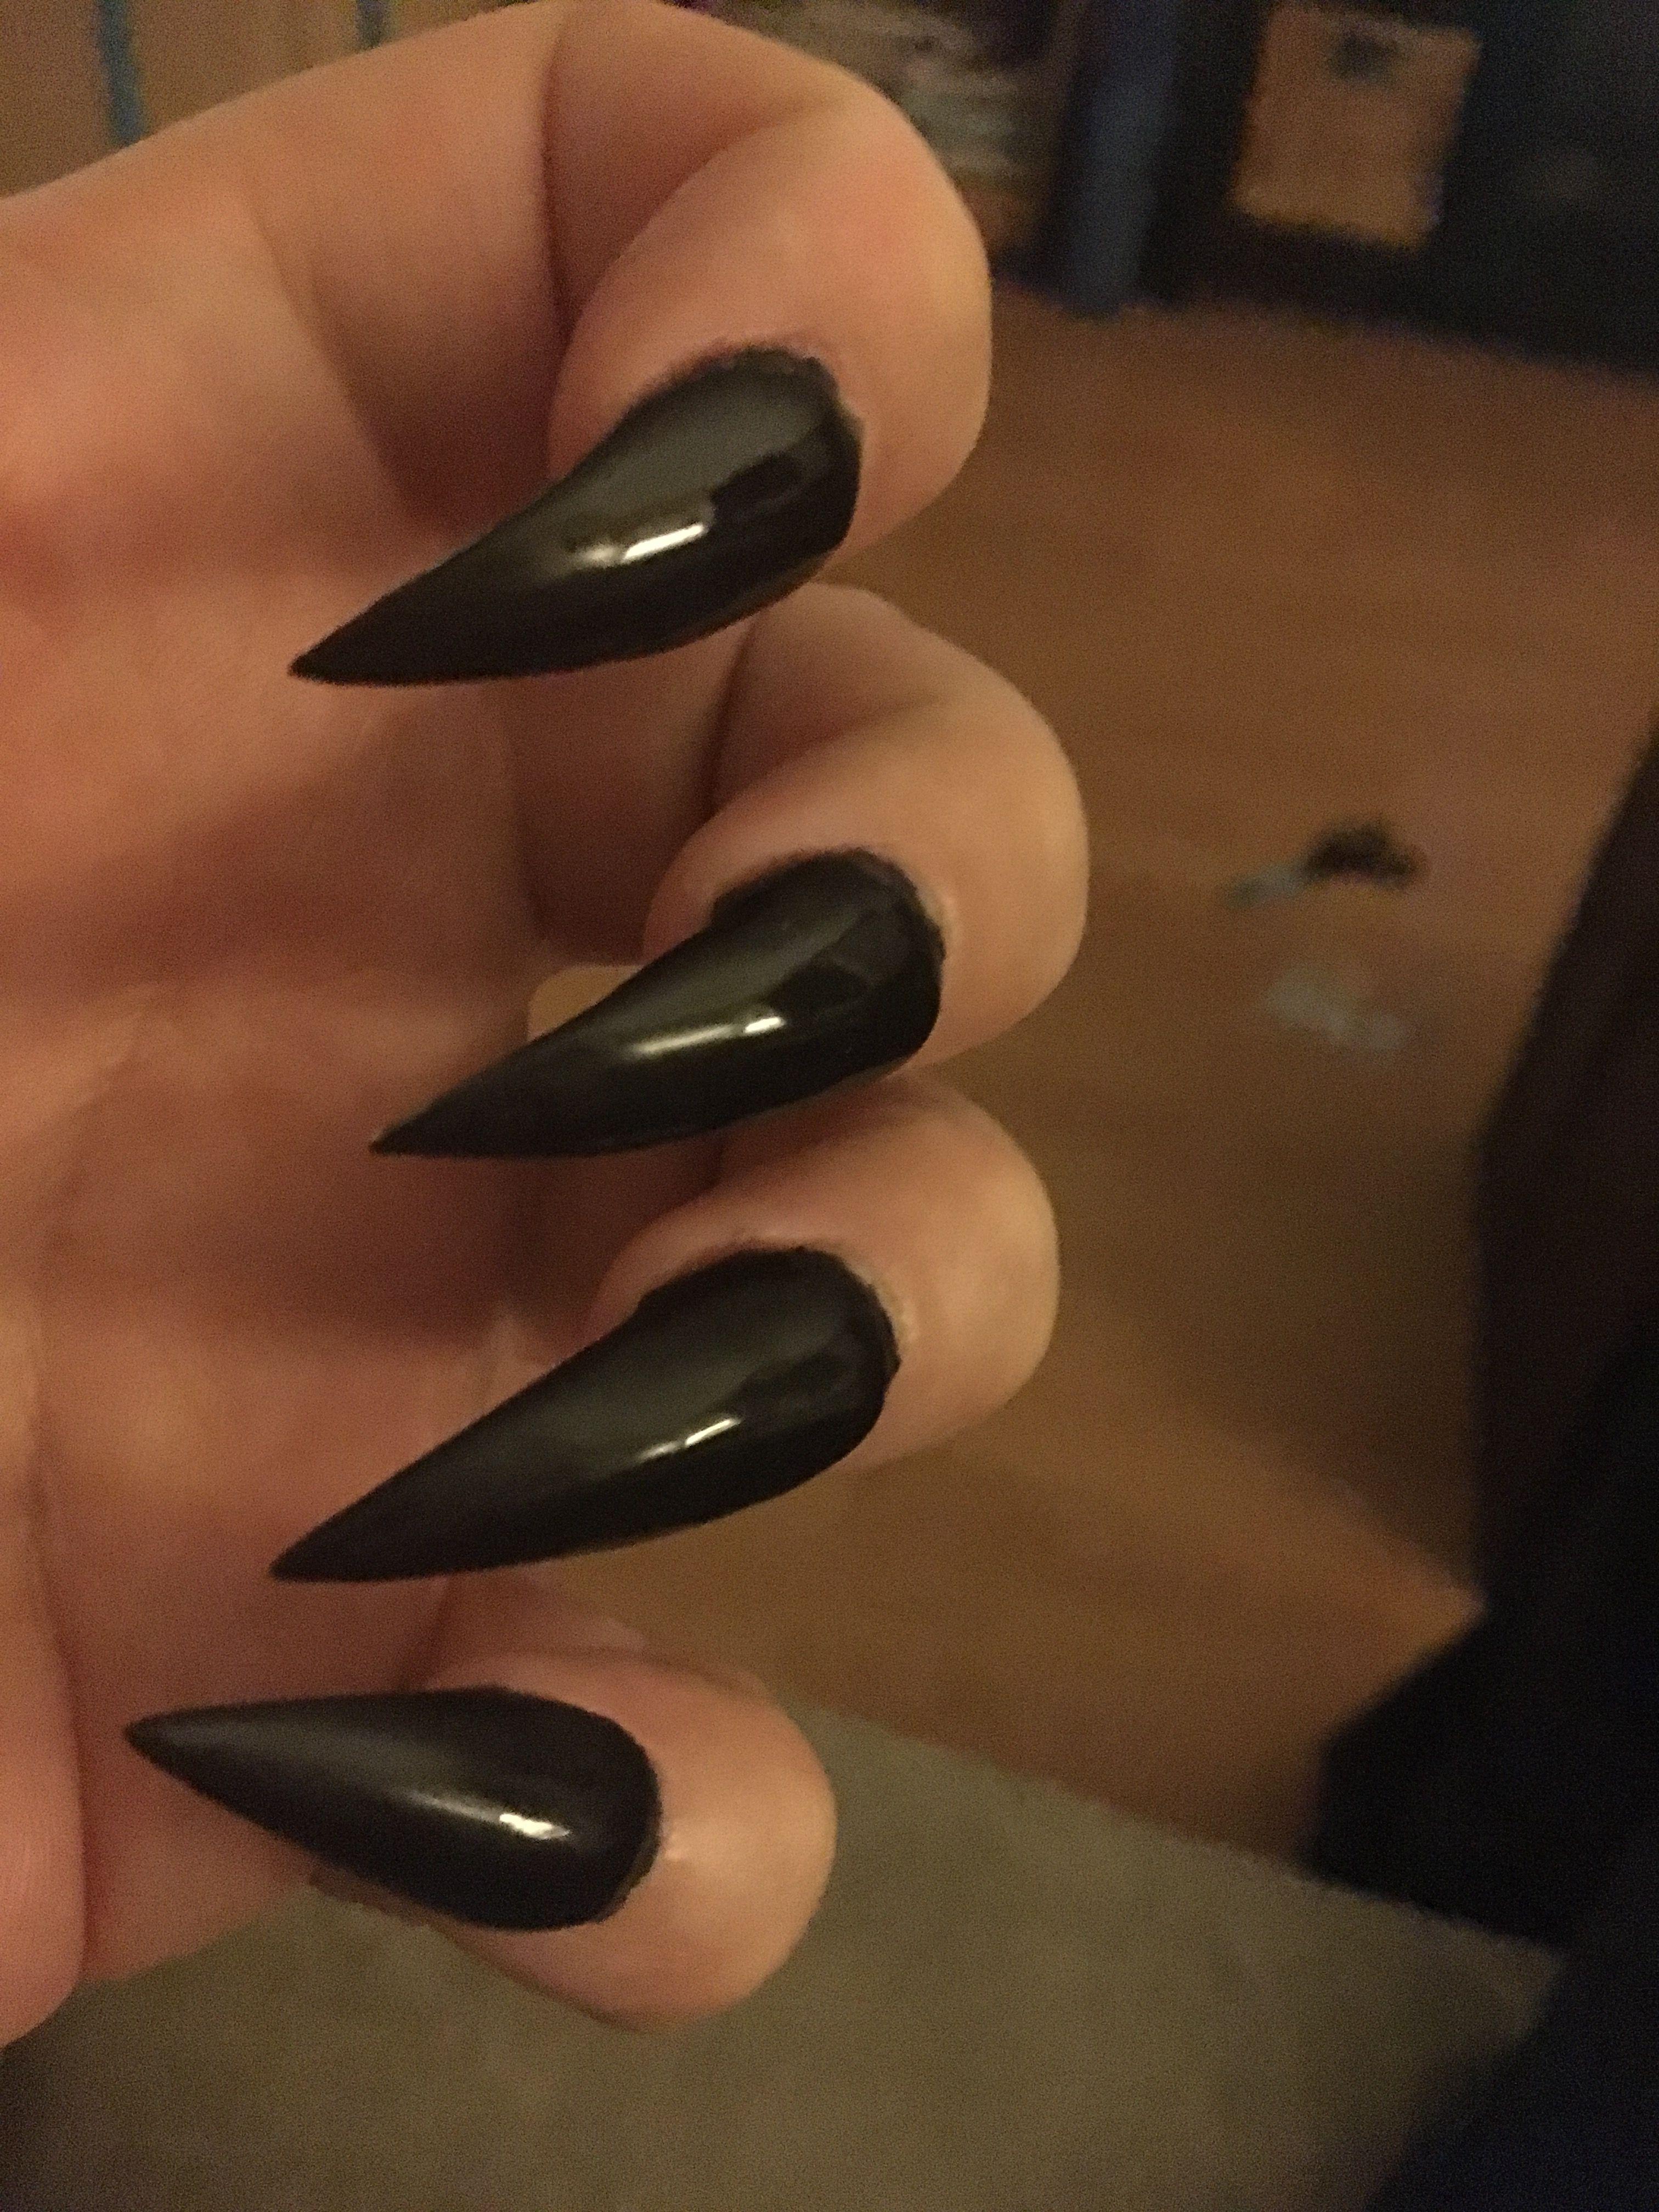 Black Claws Black Stiletto Nails Stiletto Nails Curved Nails